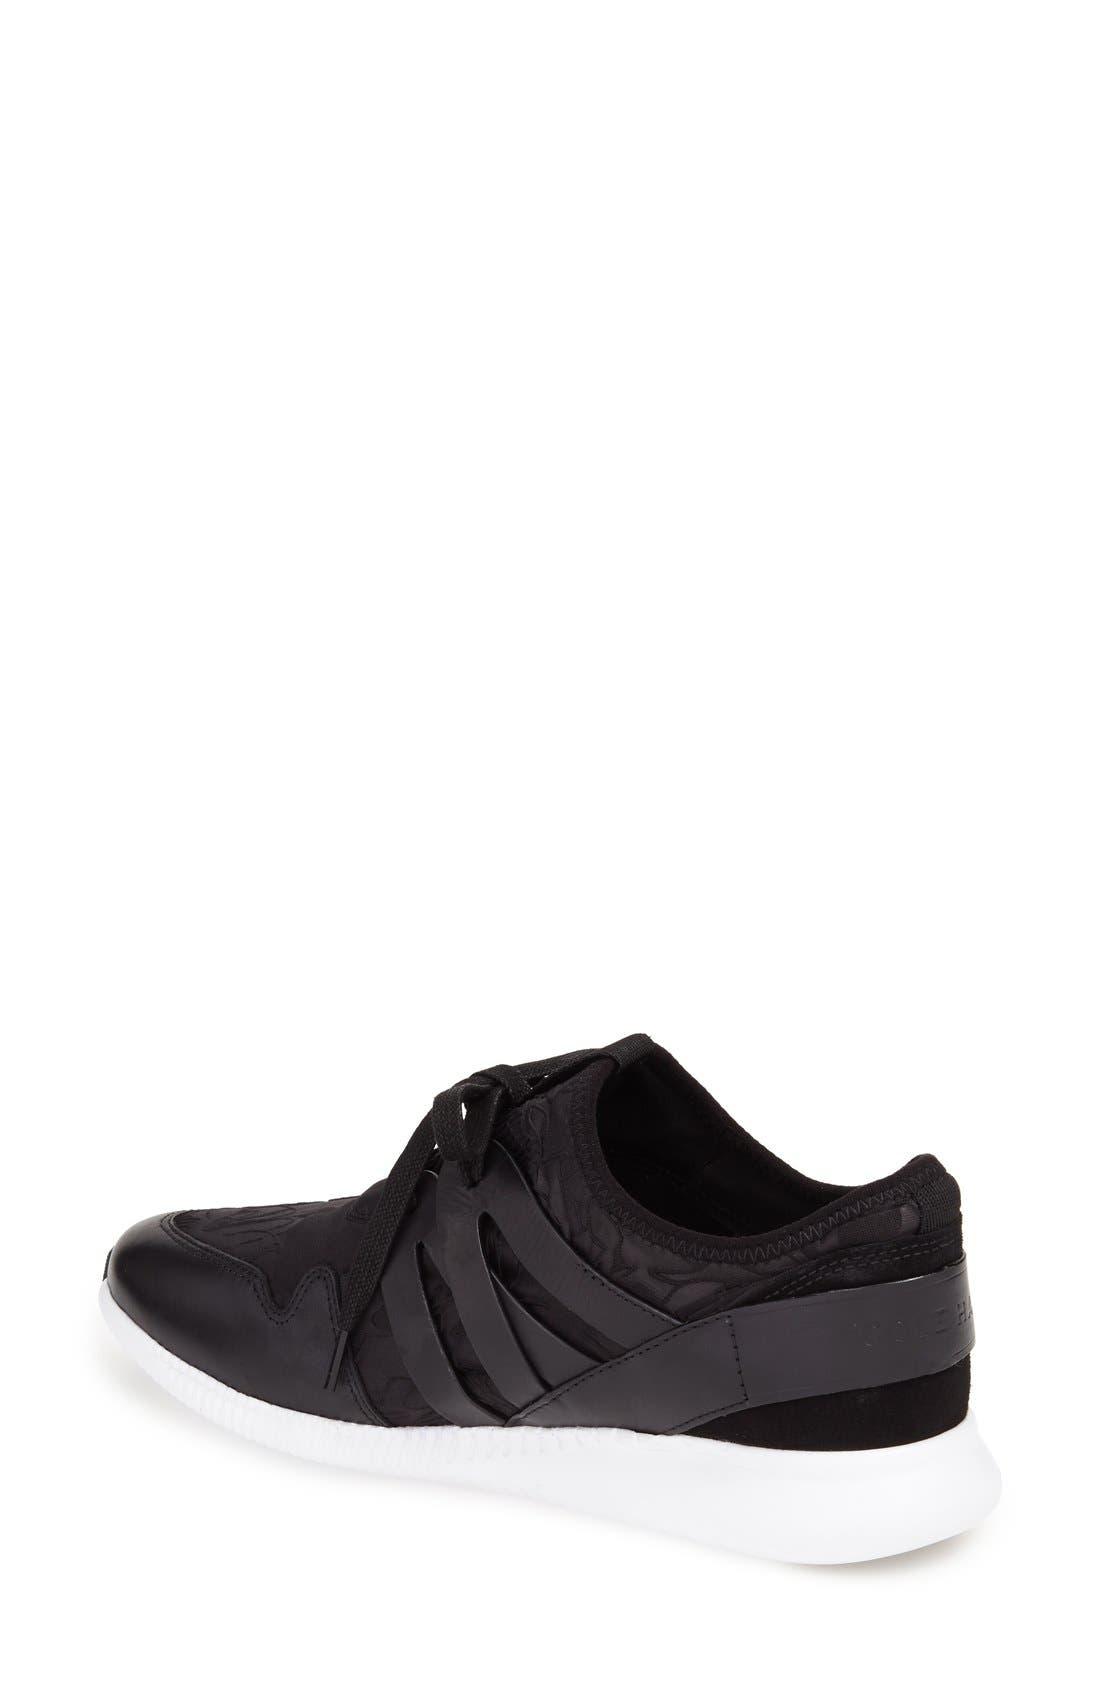 'StudioGrand' Sneaker,                             Alternate thumbnail 12, color,